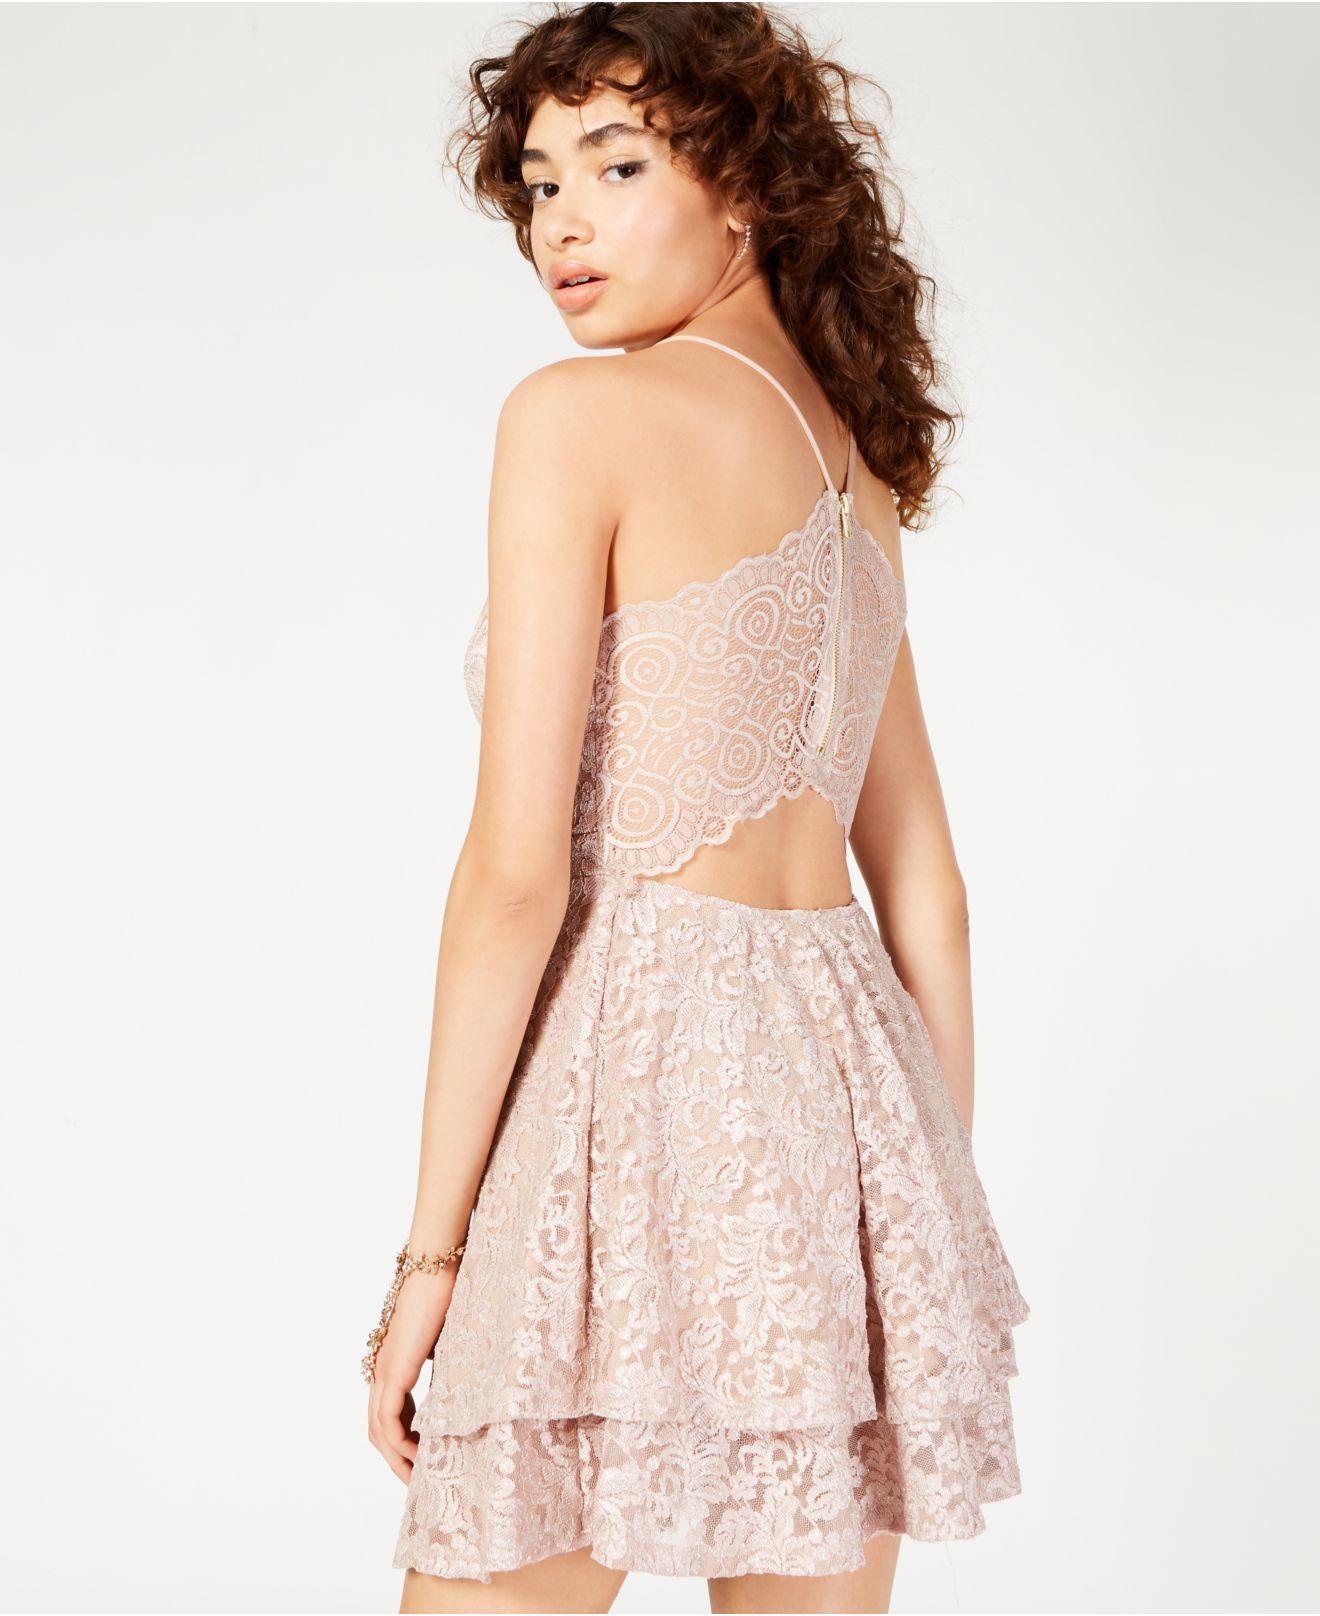 0baacd49 Emerald Sundae - Pink Juniors' Glitter Lace Racerback Dress - Lyst. View  fullscreen